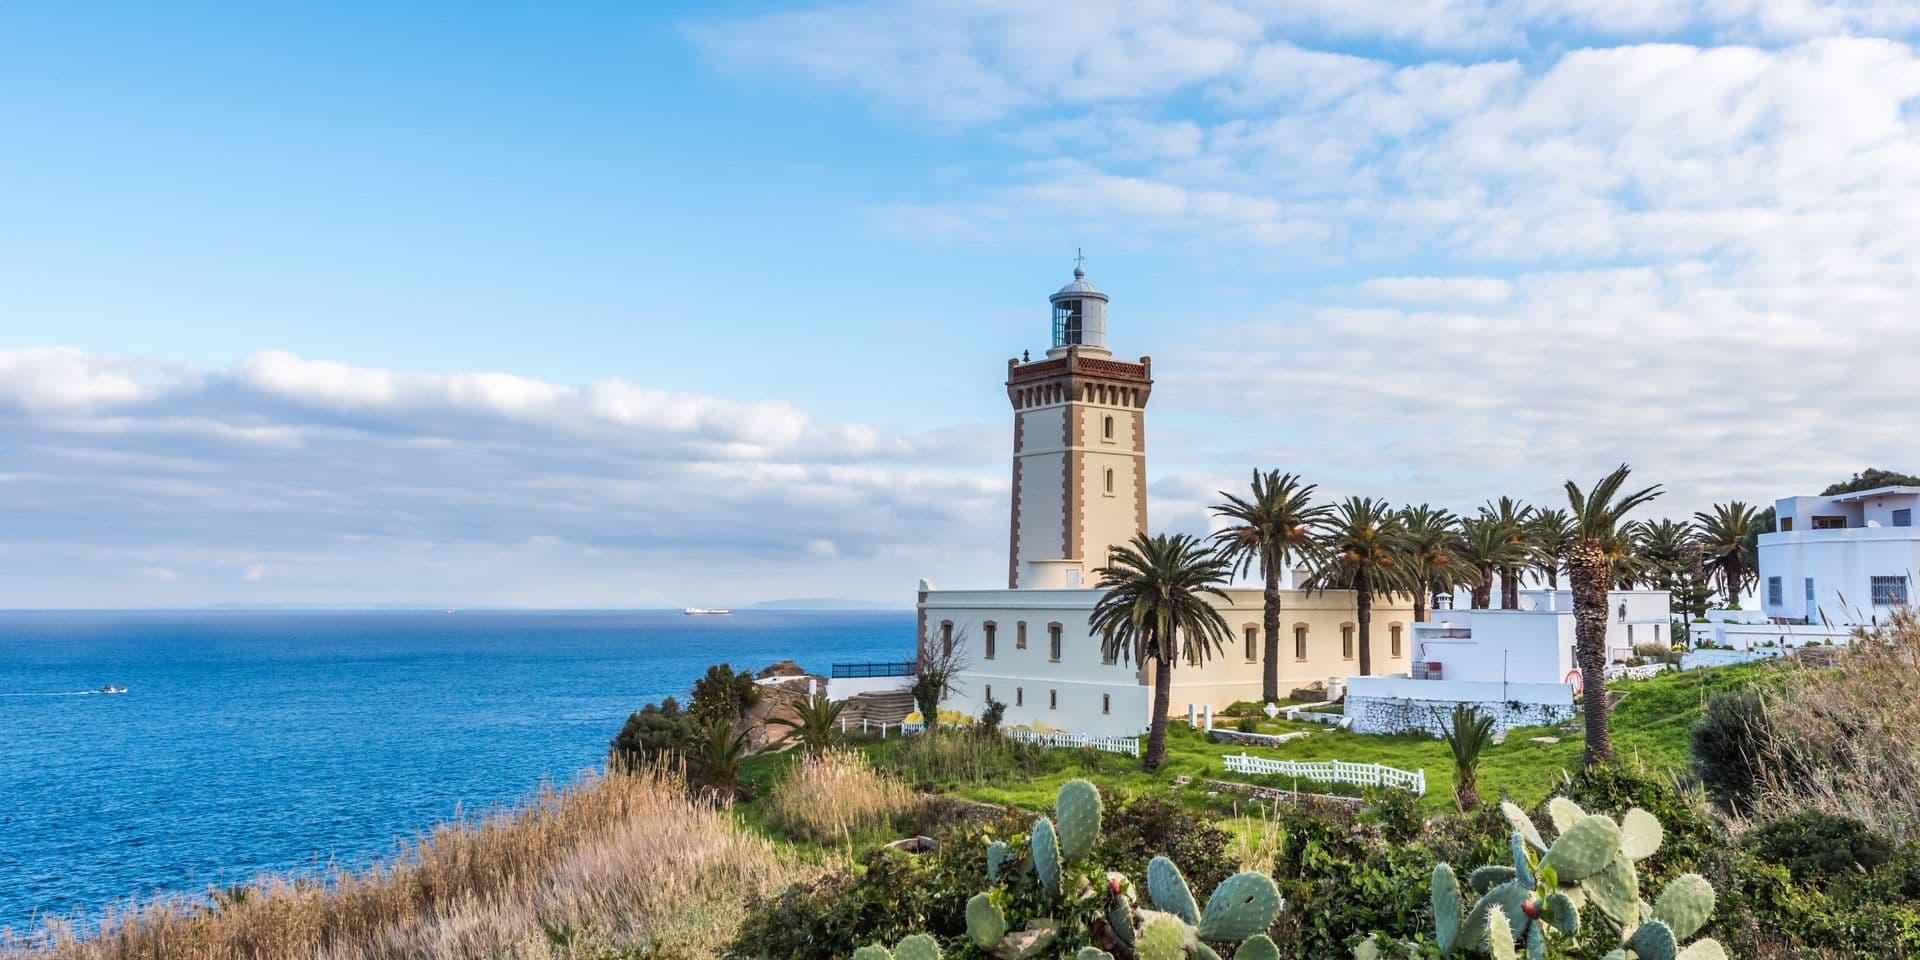 Phare du cap Spartel à Tanger (Maroc).